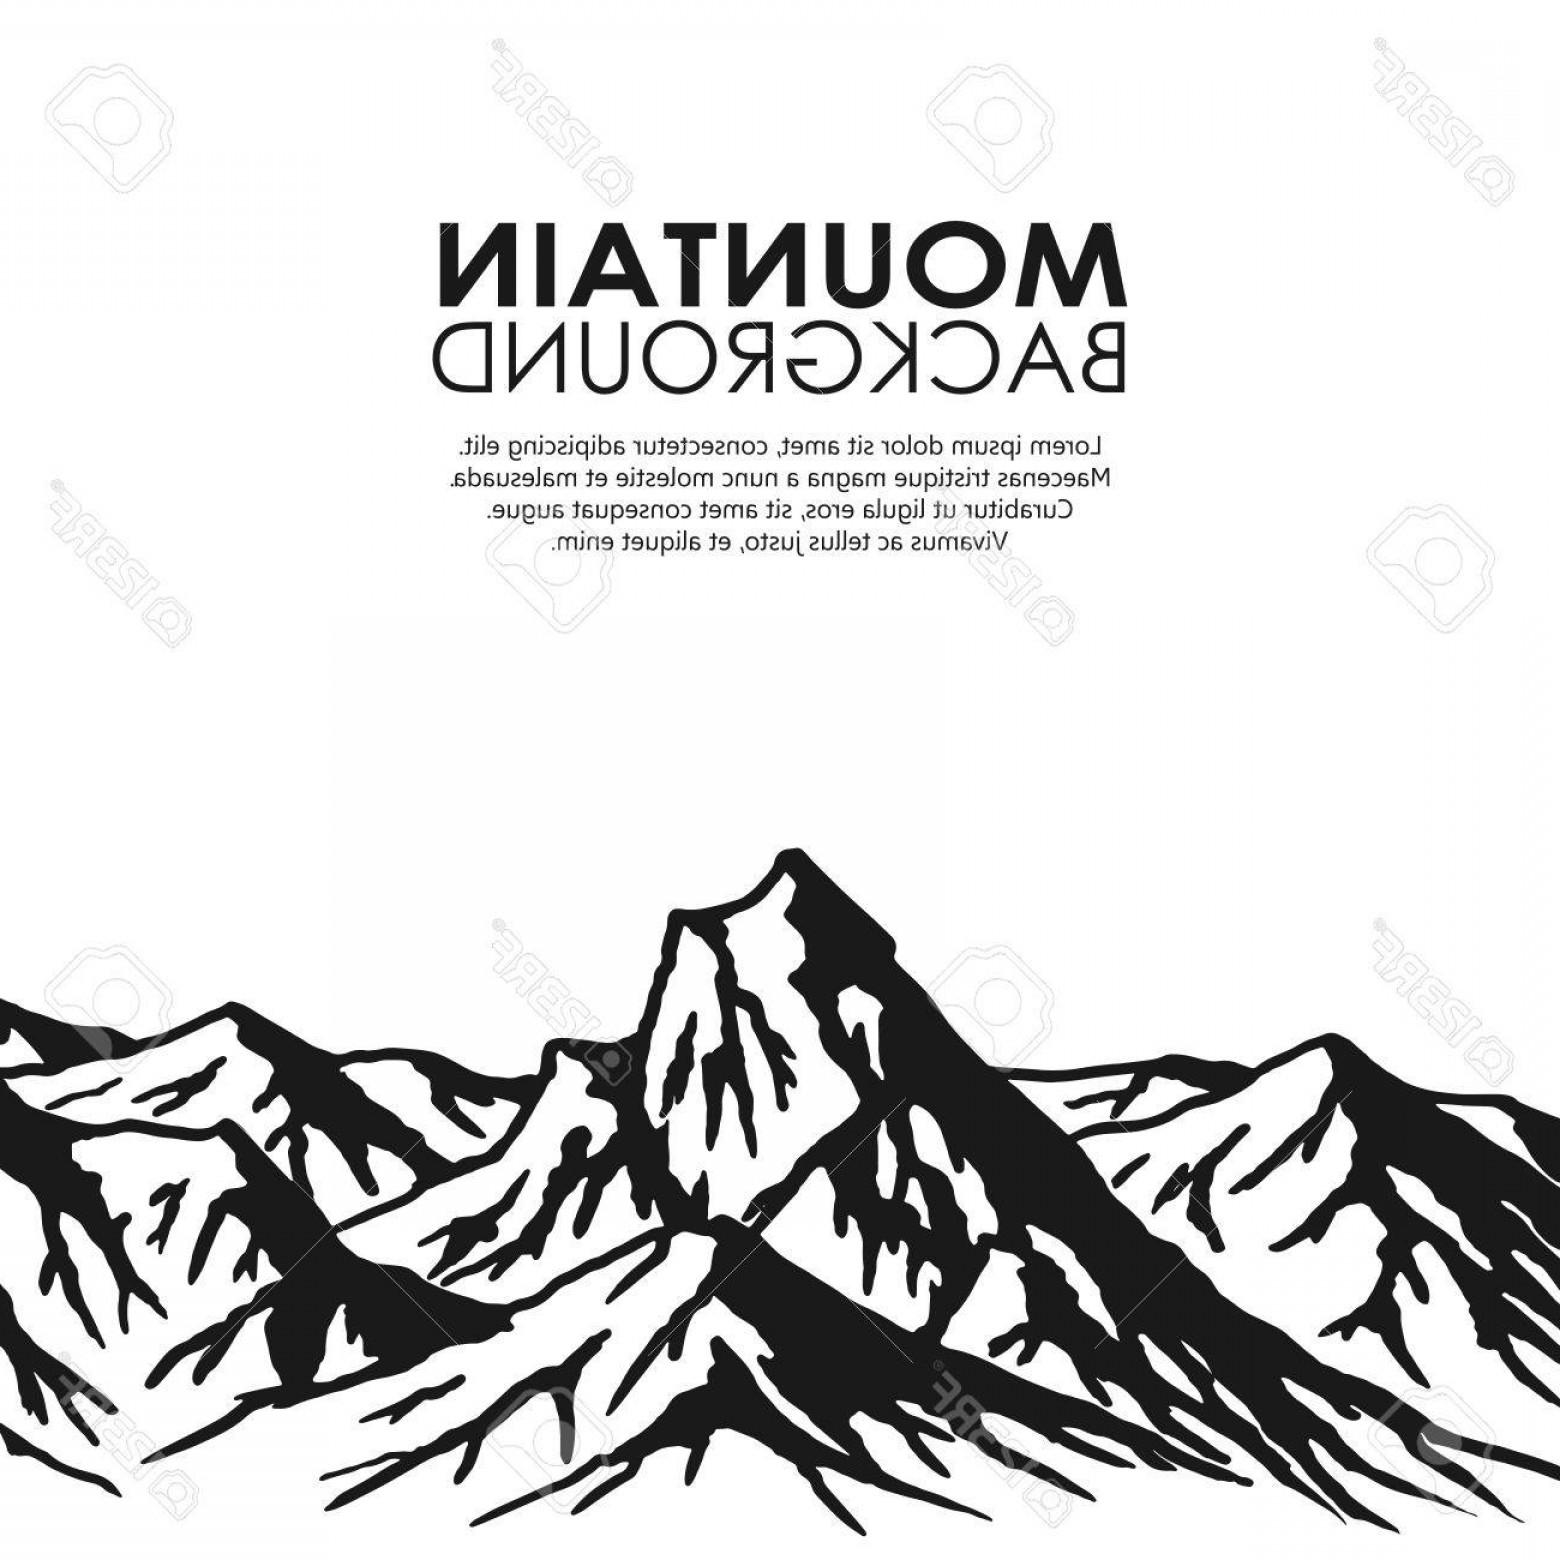 1560x1560 Photostock Vector Mountain Range Isolated On White Background